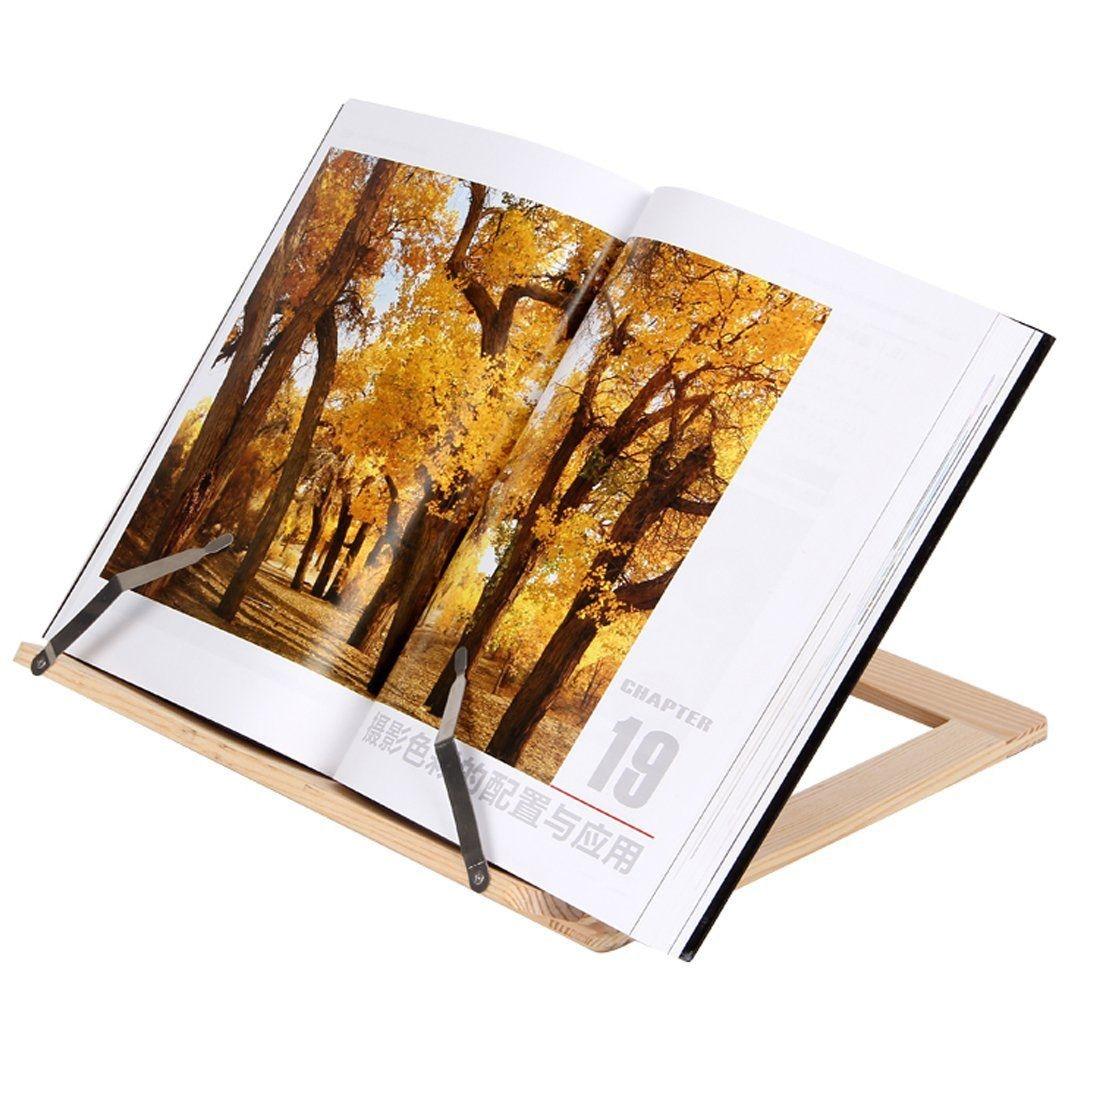 Wooden Frame Reading Bookshelf Bracket - Book Reading Bracket Tablet PC Support Music Stand